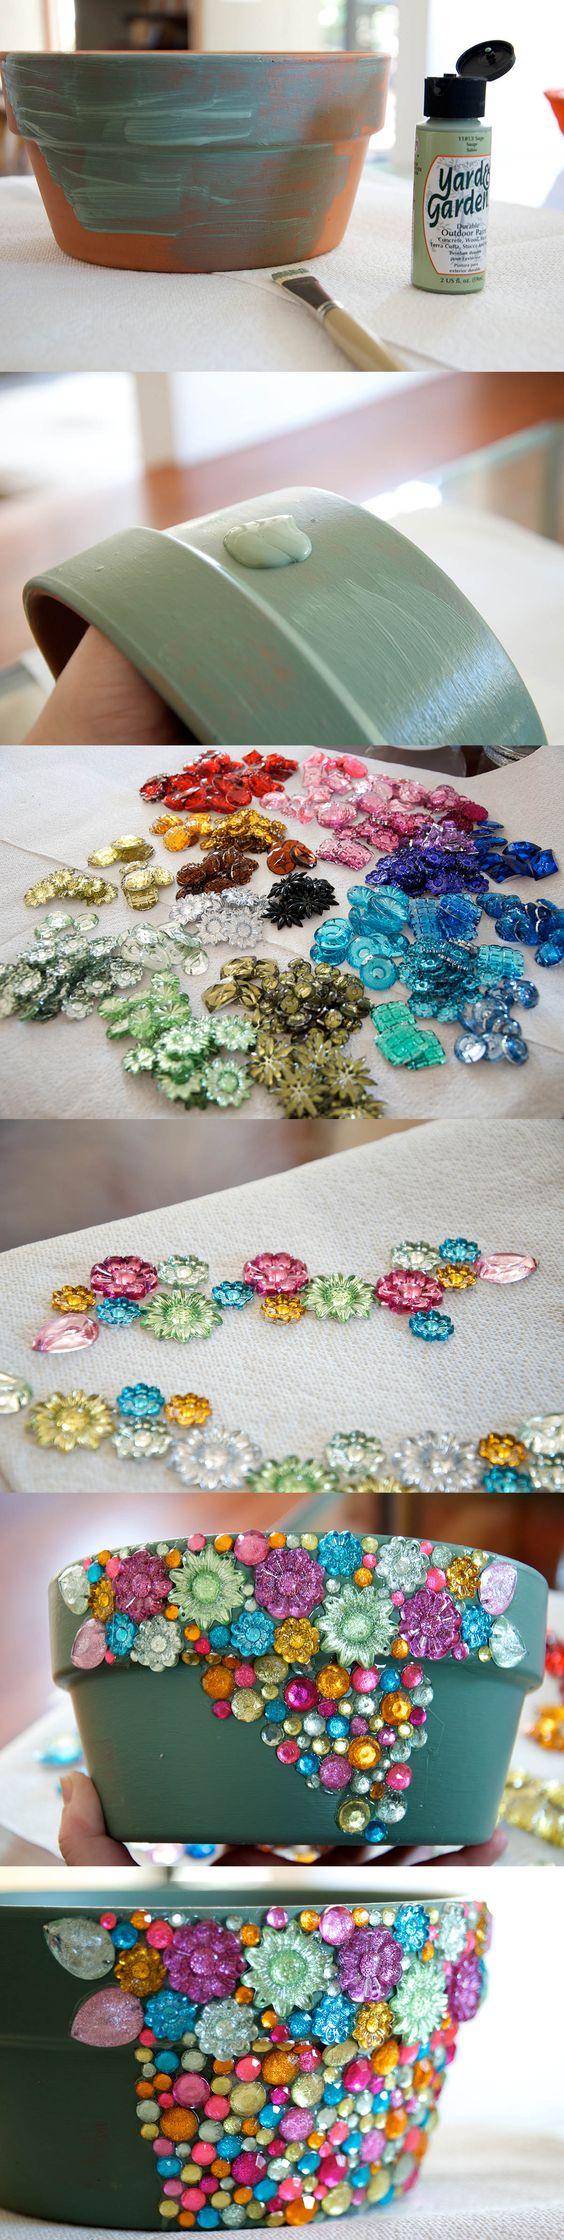 DIY Jeweled Terra Cotta Pot